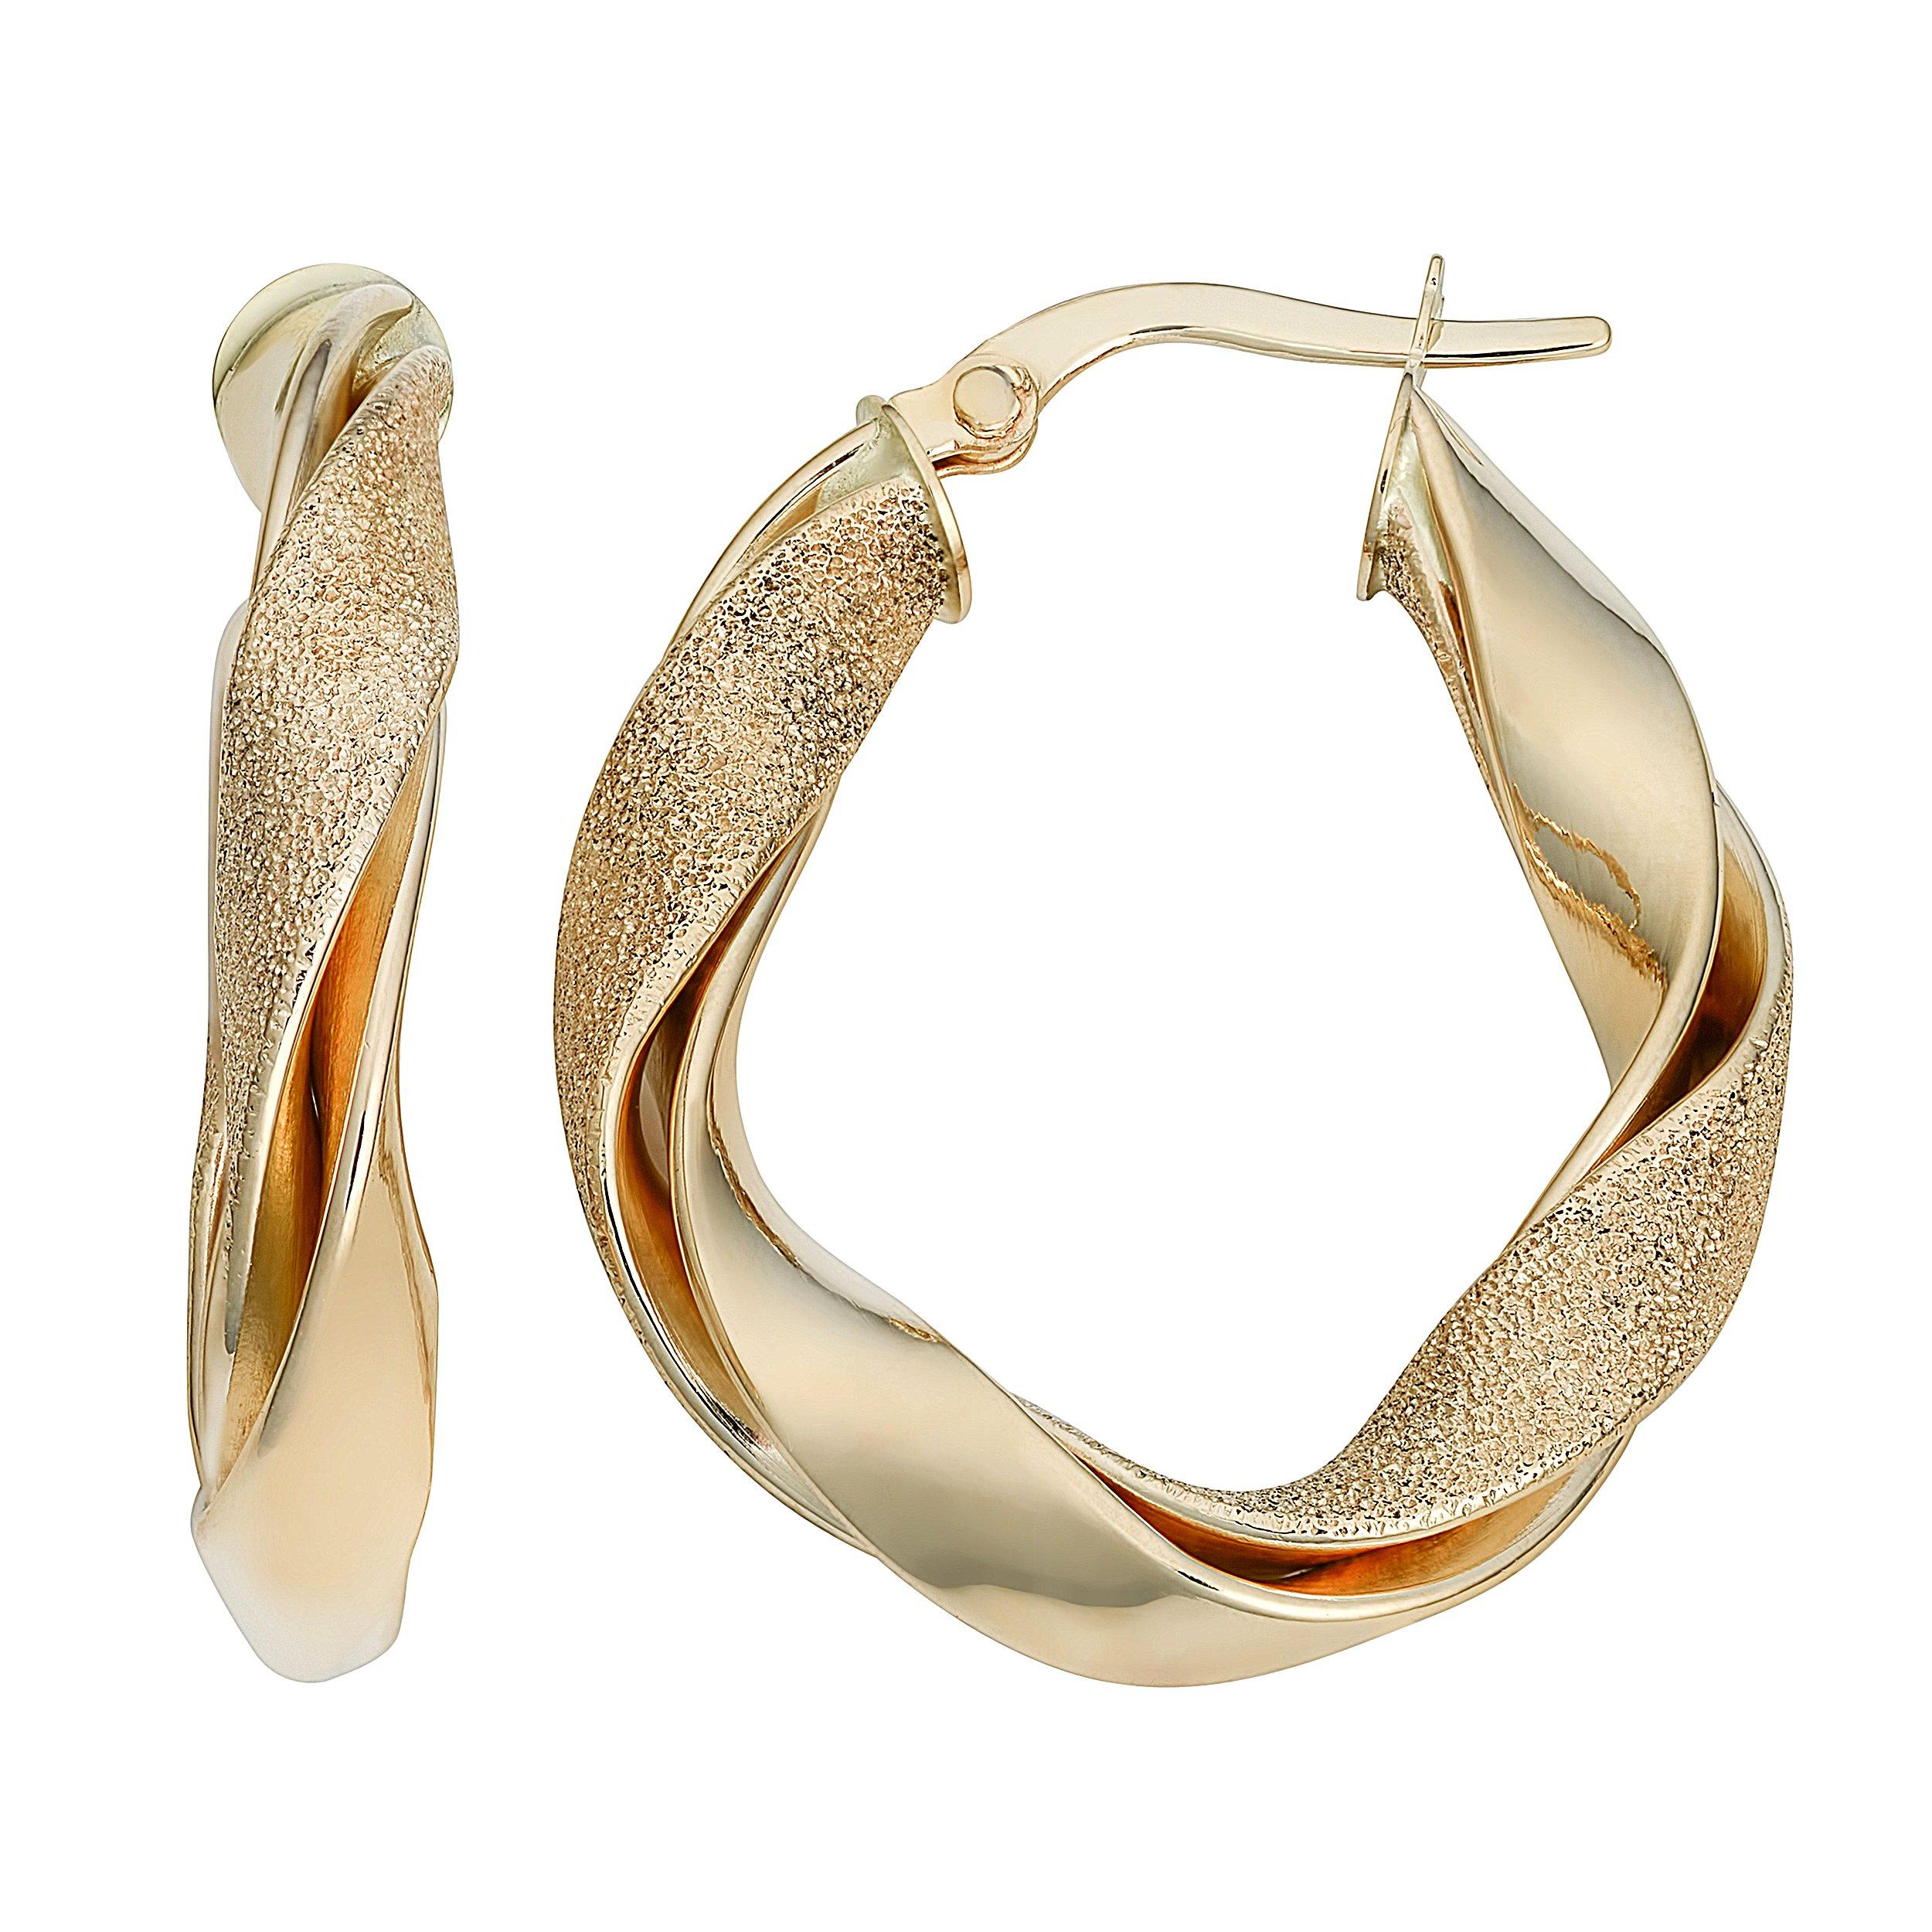 14k Yellow Gold Stylish Twisted Oval Hoop Earrings